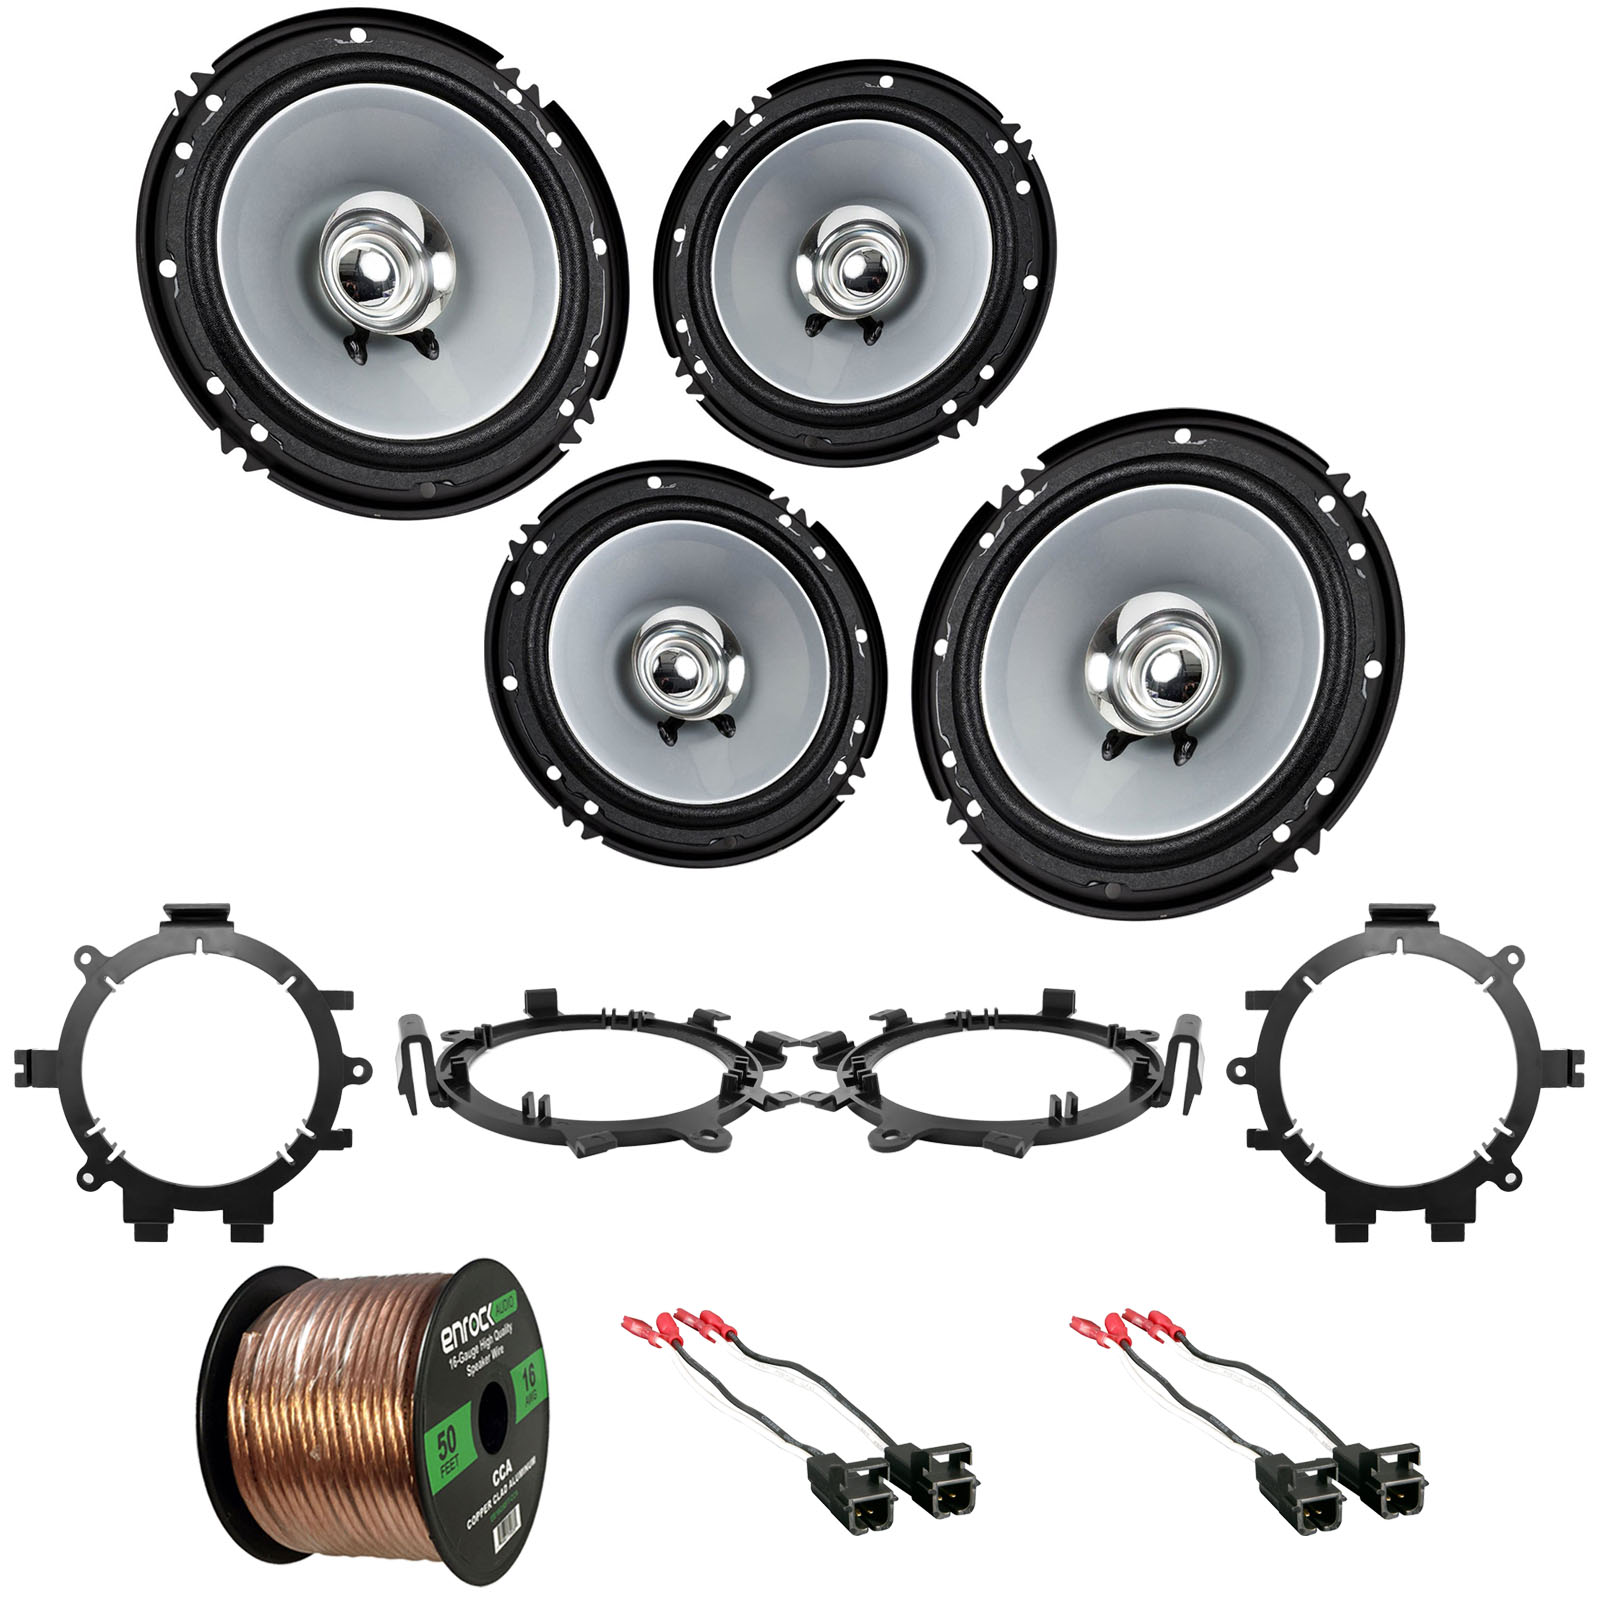 "4x Kenwood KFCC1656S 6.5"" 2-Way Flush Mount Speakers (Black/Silver Color), 4x Metra Speaker Wire Harness, 4x Speaker Mounting Brackets Adaptors, 16-Gauge 50 Foot Wire (Select 1995-2009 Vehicles)"